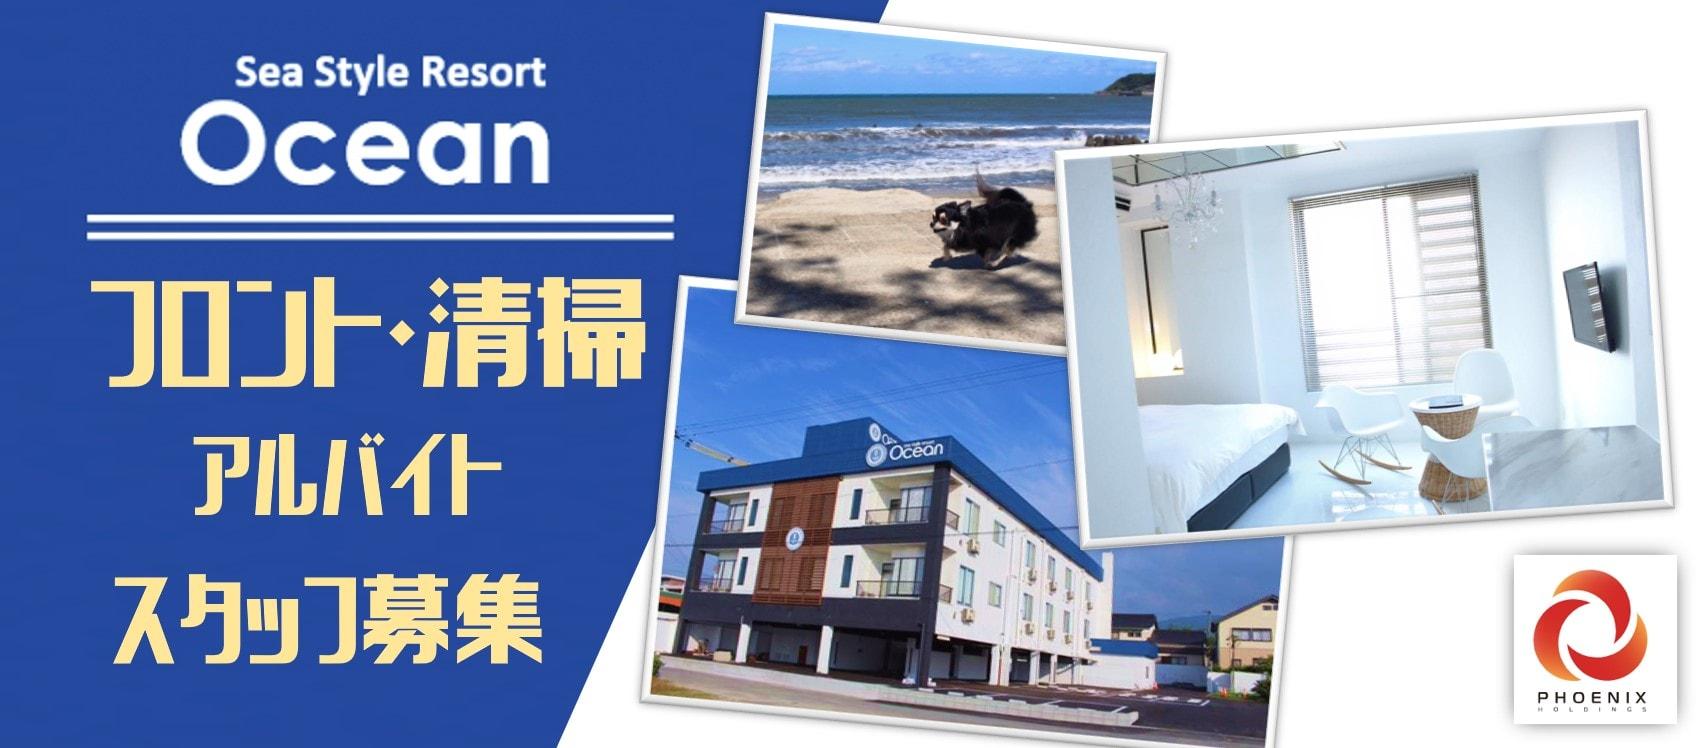 Sea Style Resort Ocean フロント・清掃 アルバイトスタッフ募集